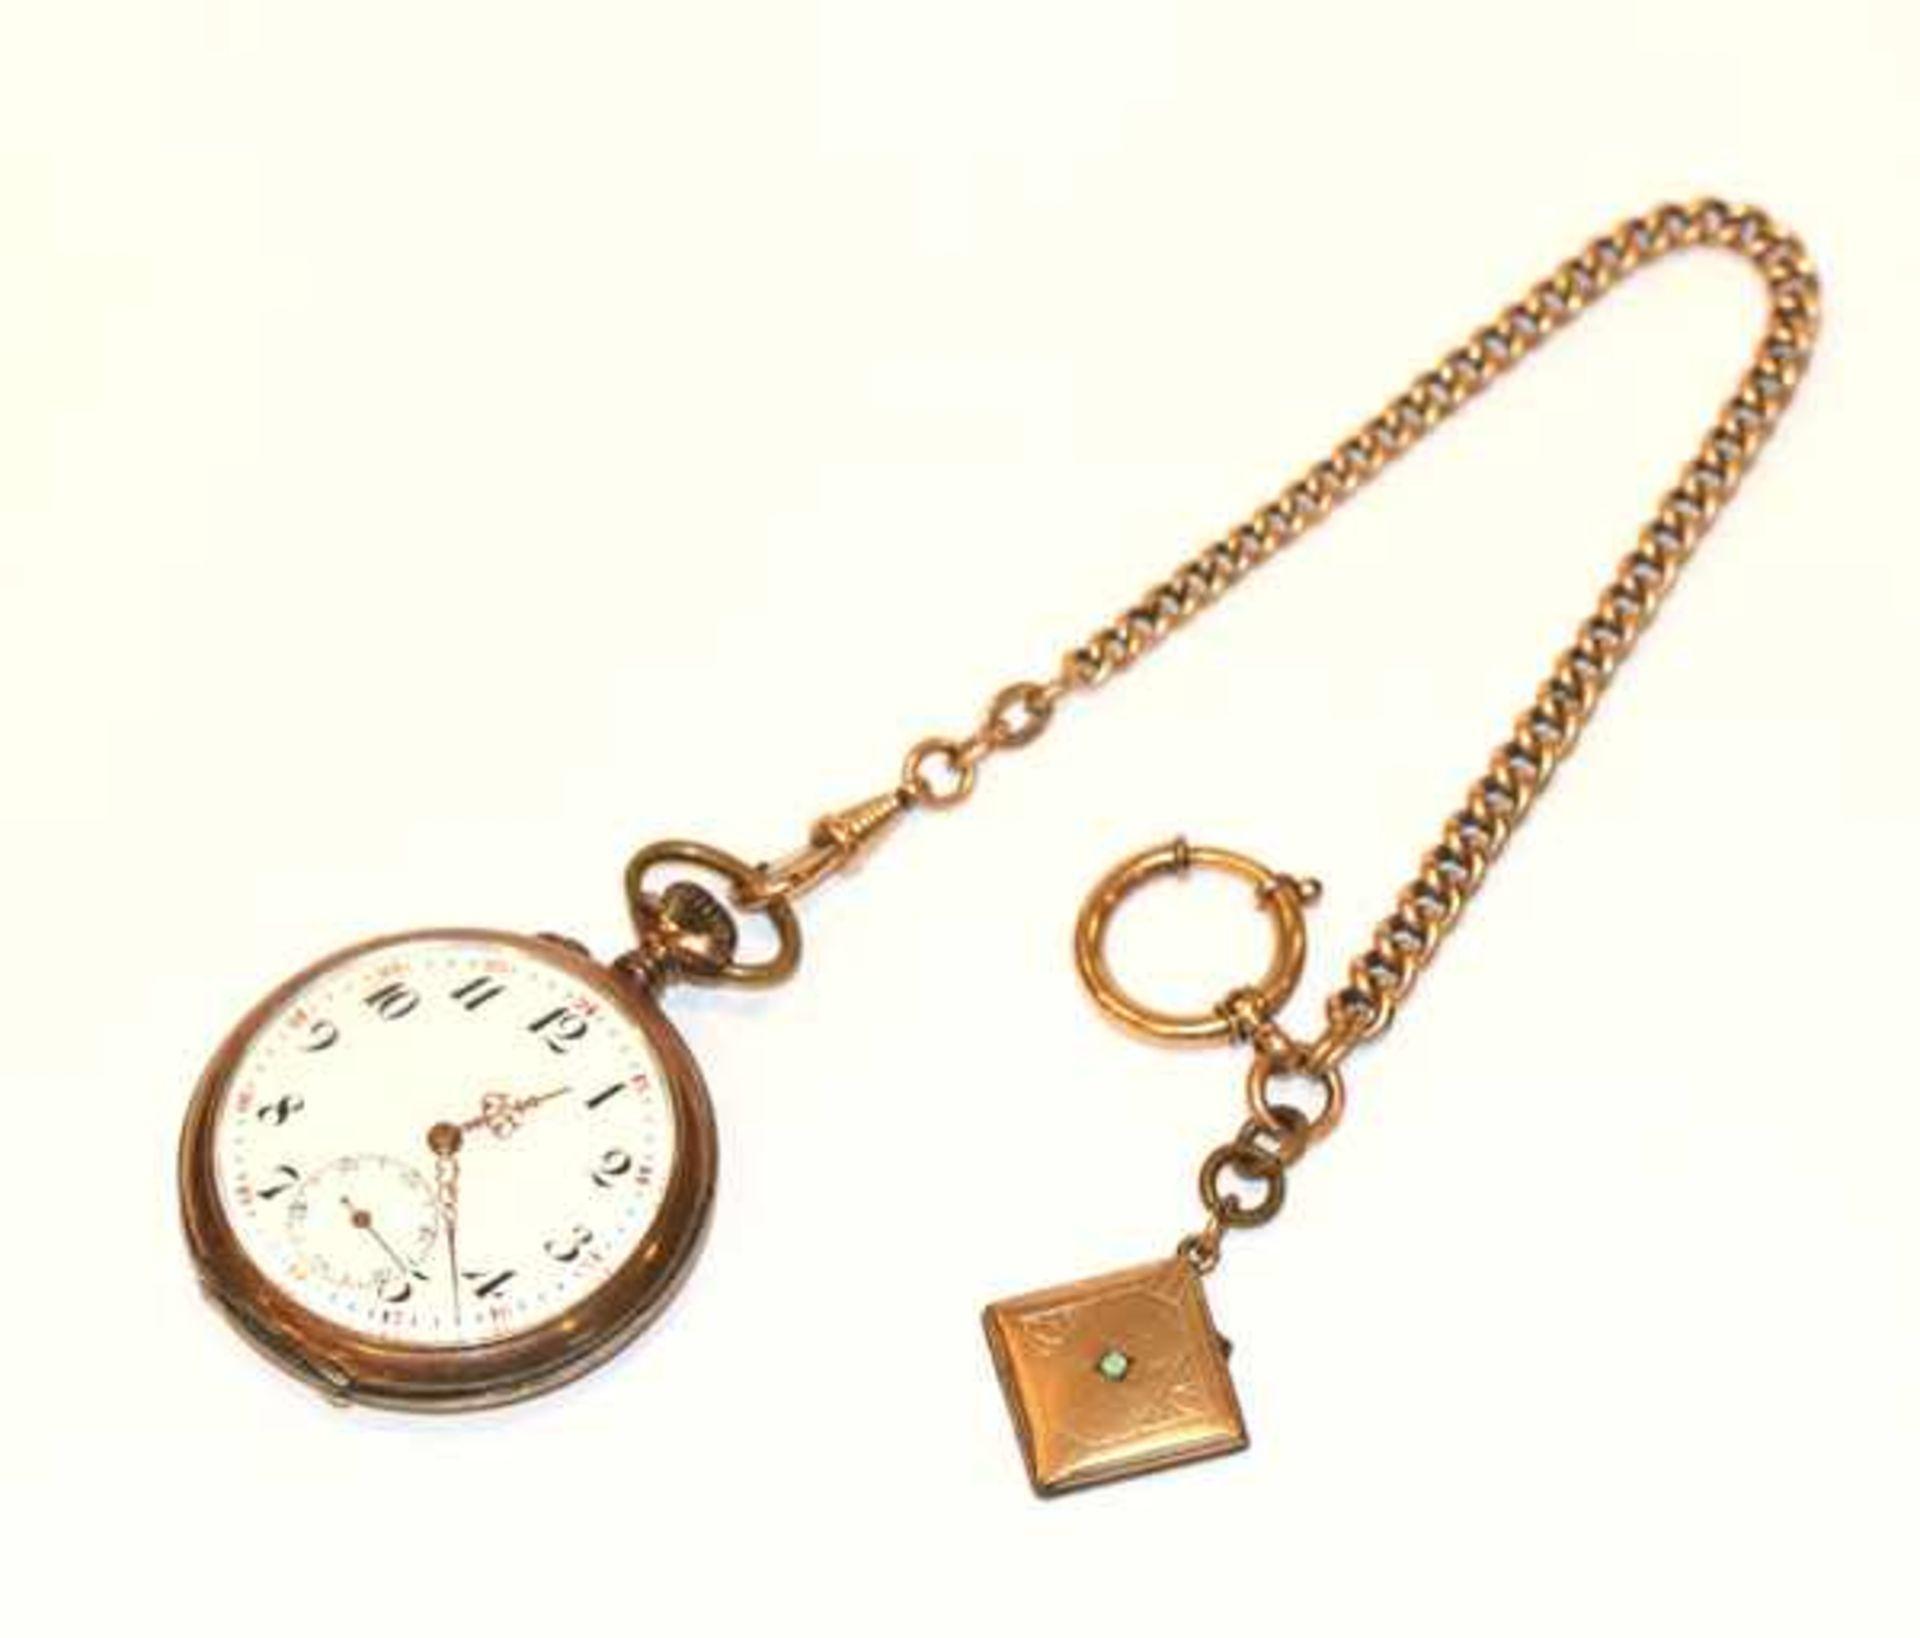 Los 57 - Silber Taschenuhr, intakt, D 5 cm, an Doublé Kette, L 24 cm, mit Medaillonanhänger zum Aufklappen,